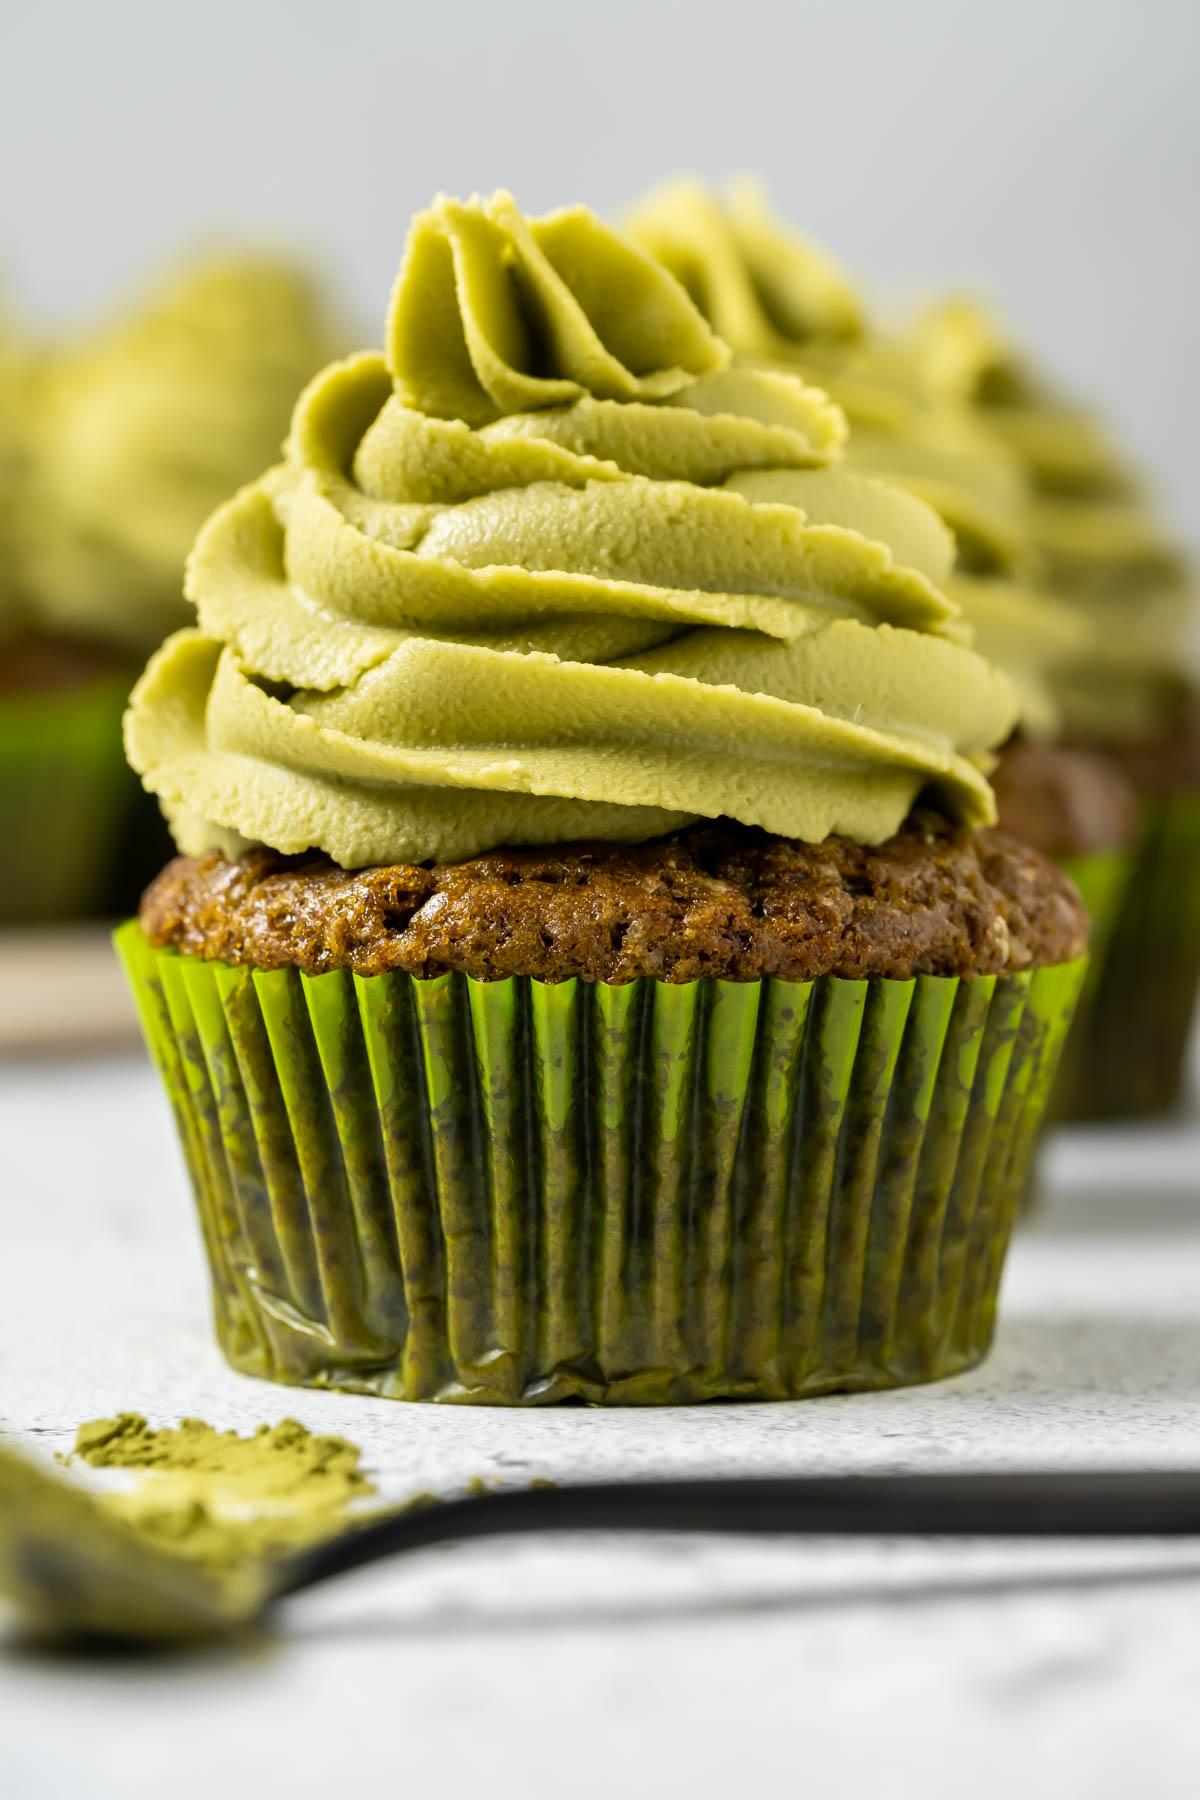 Vegan matcha cupcakes on a white plate.